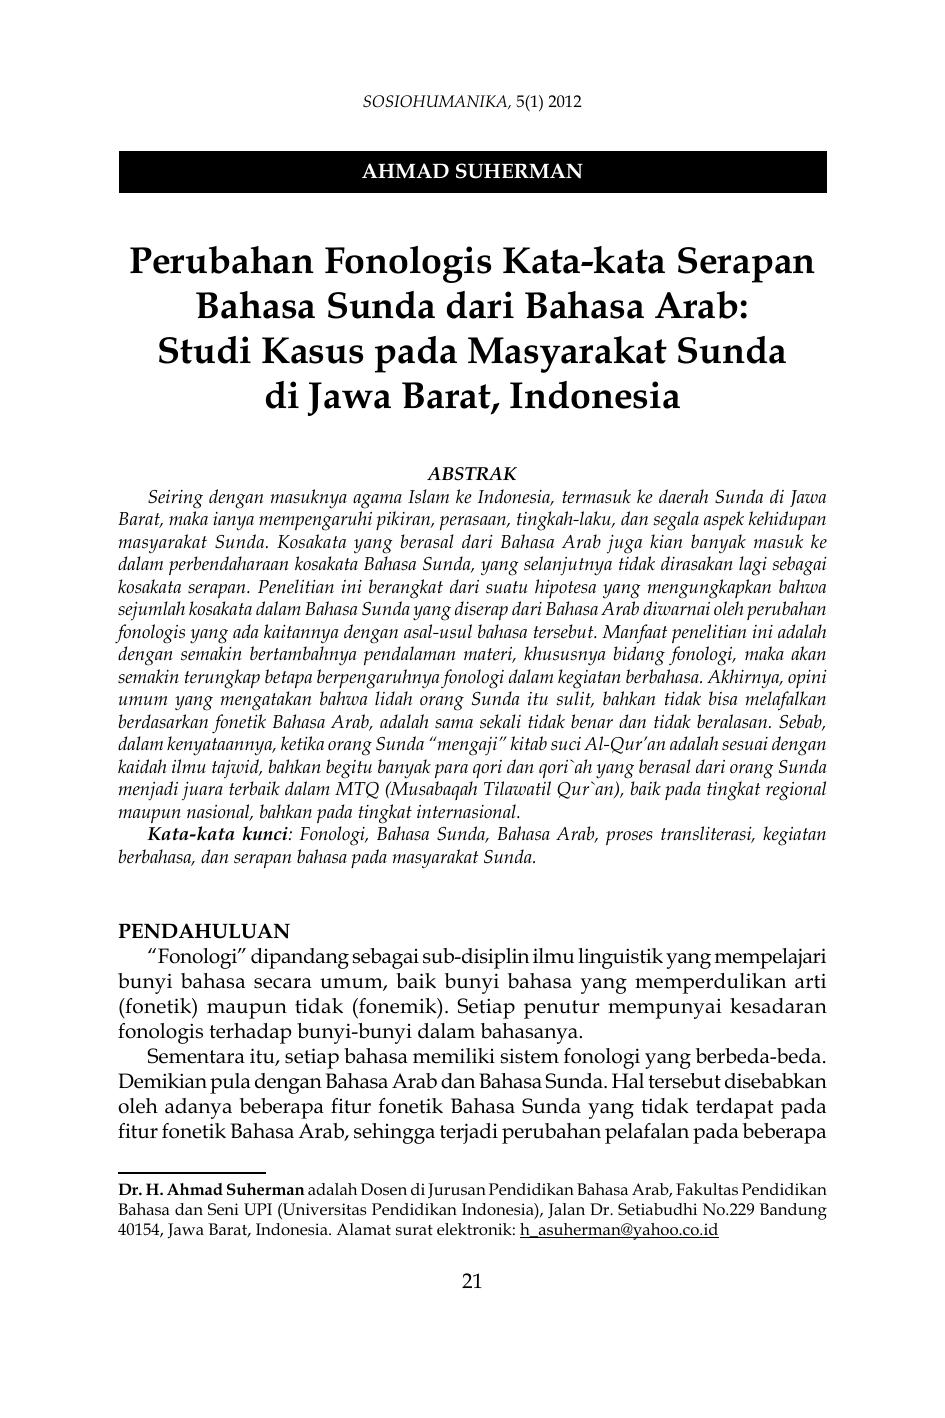 Perubahan Fonologis Kata Kata Serapan Bahasa Sunda Dari